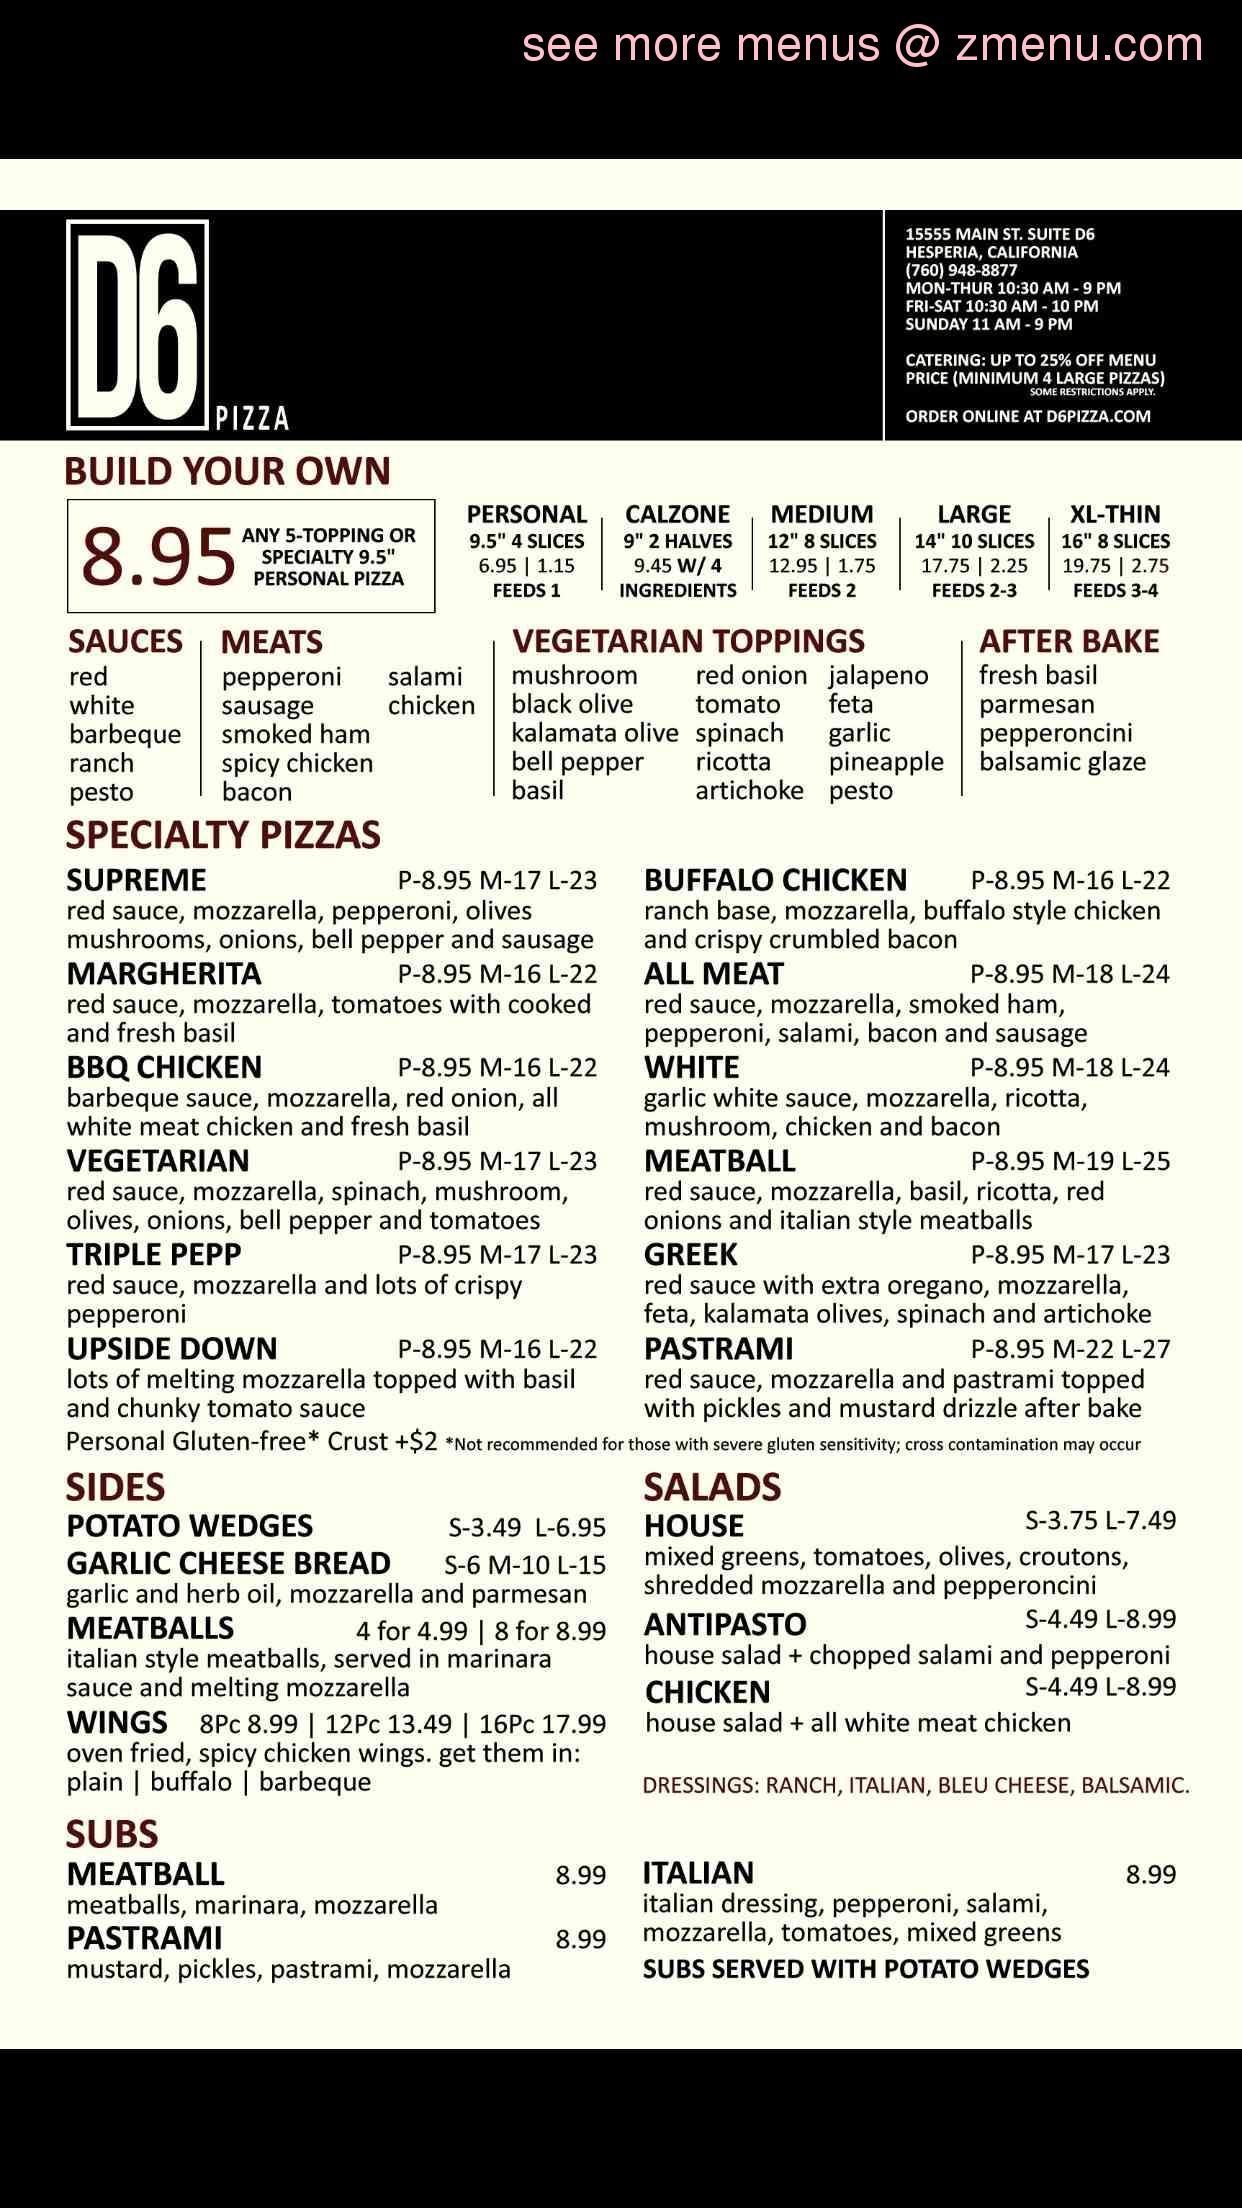 Online Menu Of D6 Pizza Restaurant Hesperia California 92345 Zmenu